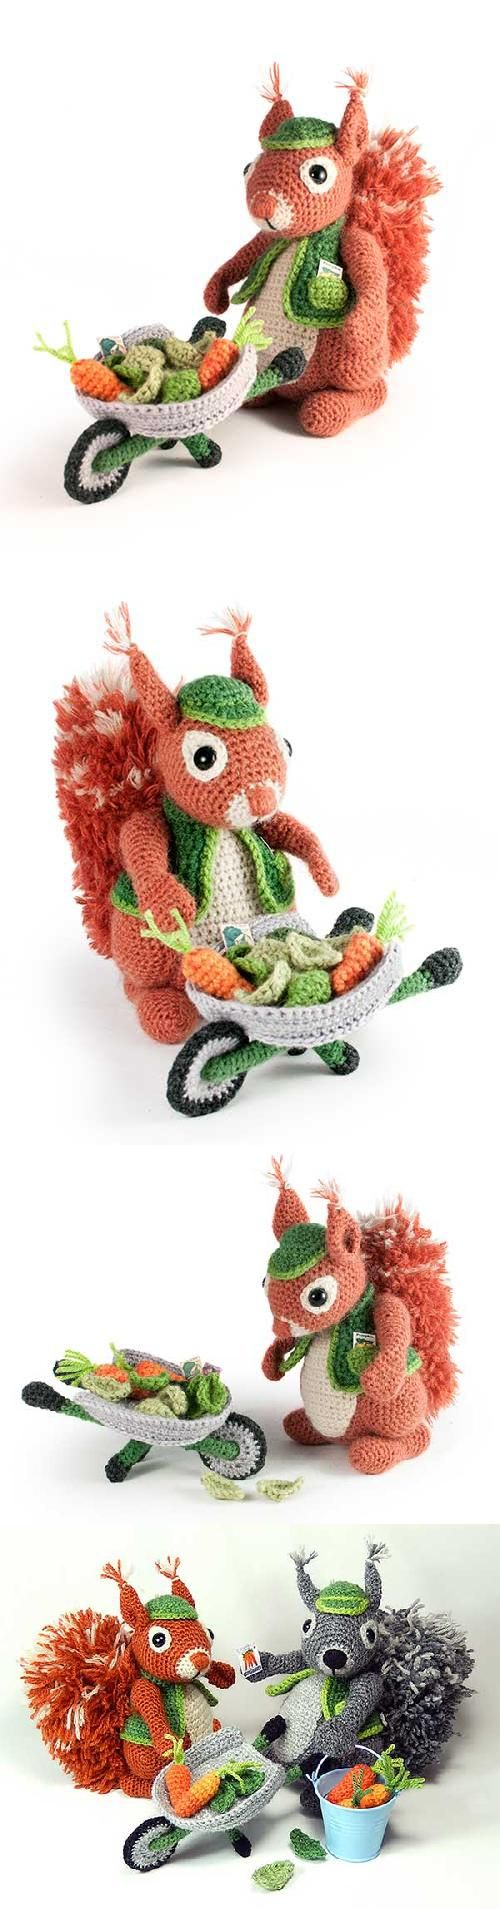 Cyril the gardener squirrel - English pattern designed by Moji-Moji design.   $ 5.90 - Found at Amigurumipatterns.net